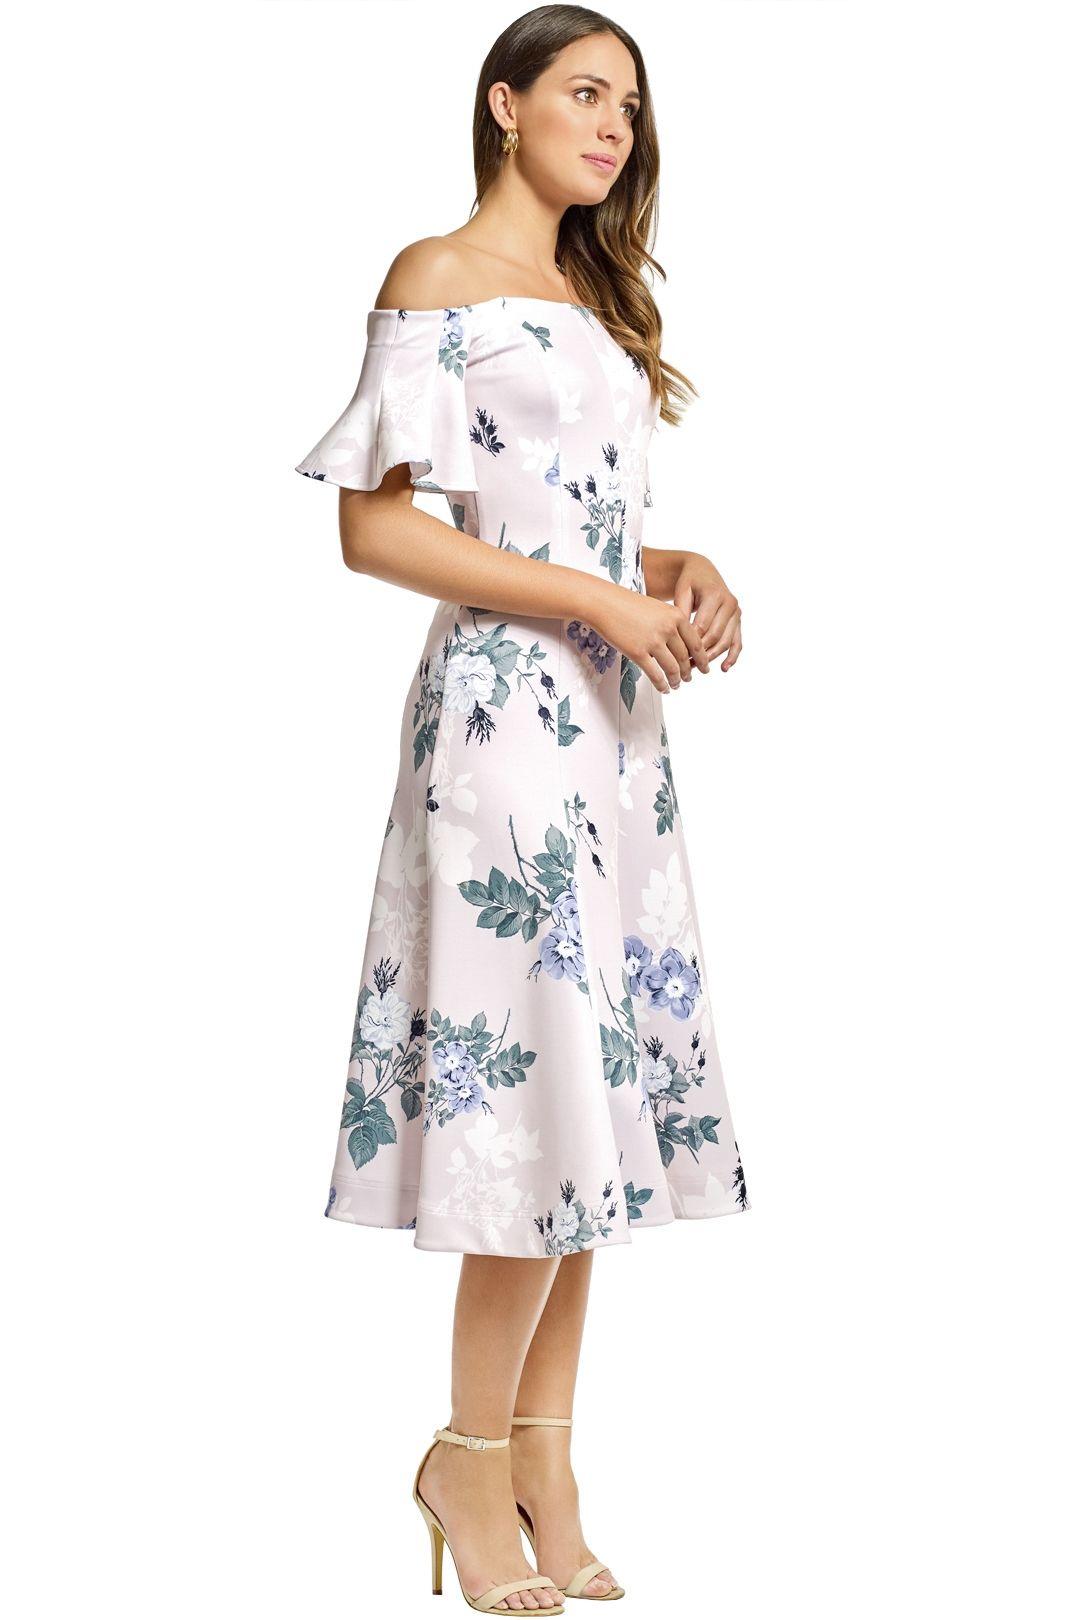 Lover - Petunia Off Shoulder Midi Dress - Pearl - Side